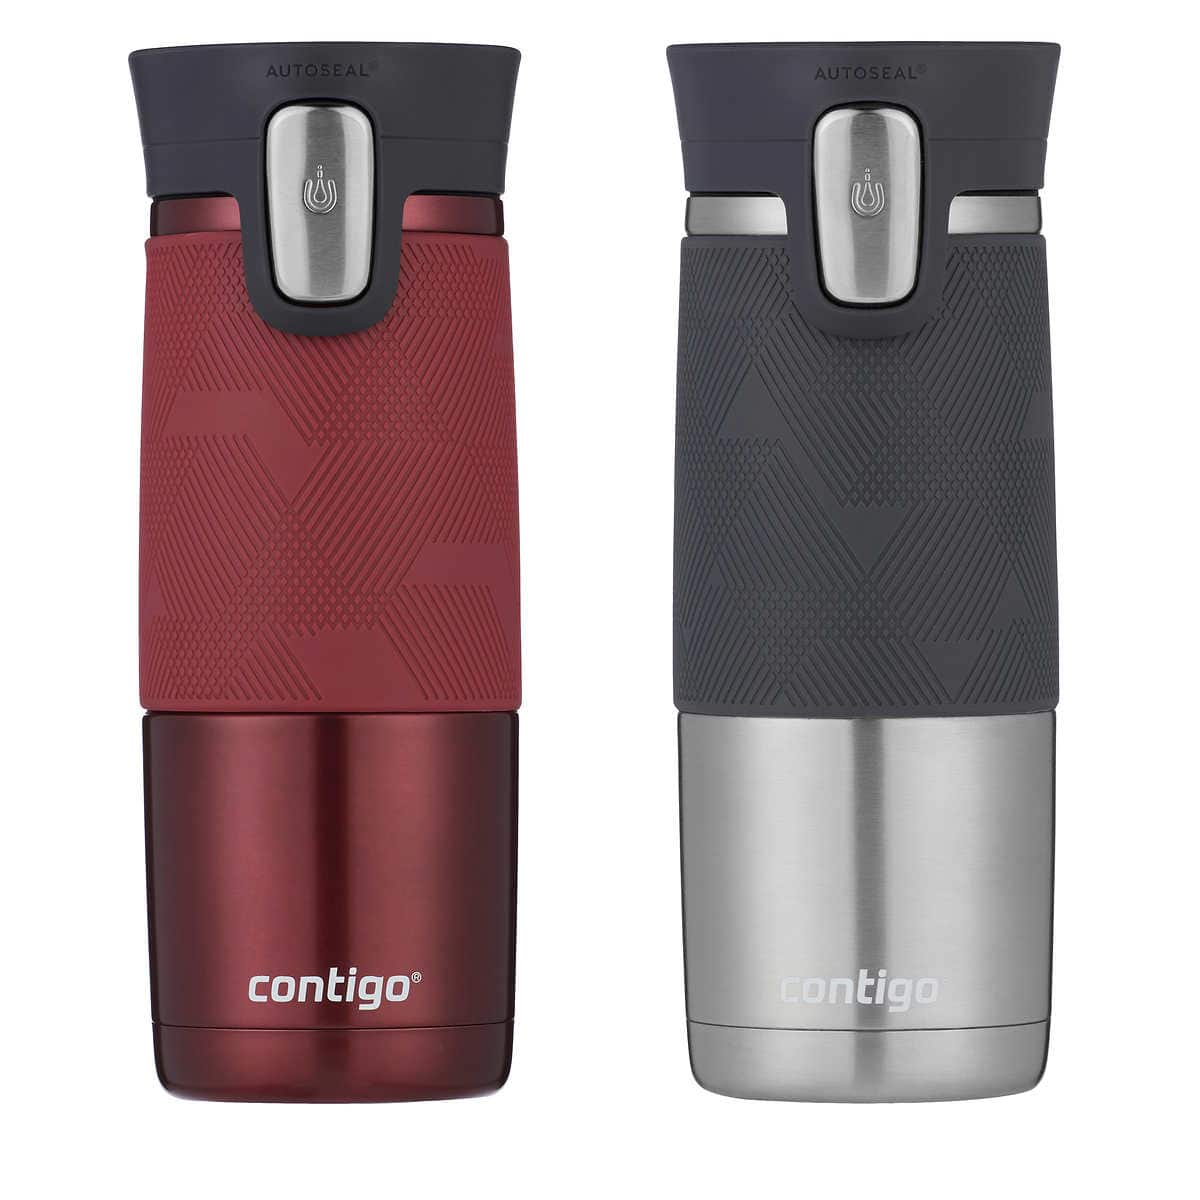 Costco - Contigo thermal travel mug  autoseal 16oz - 2 pack - $9.97 YMMV (Clearance)